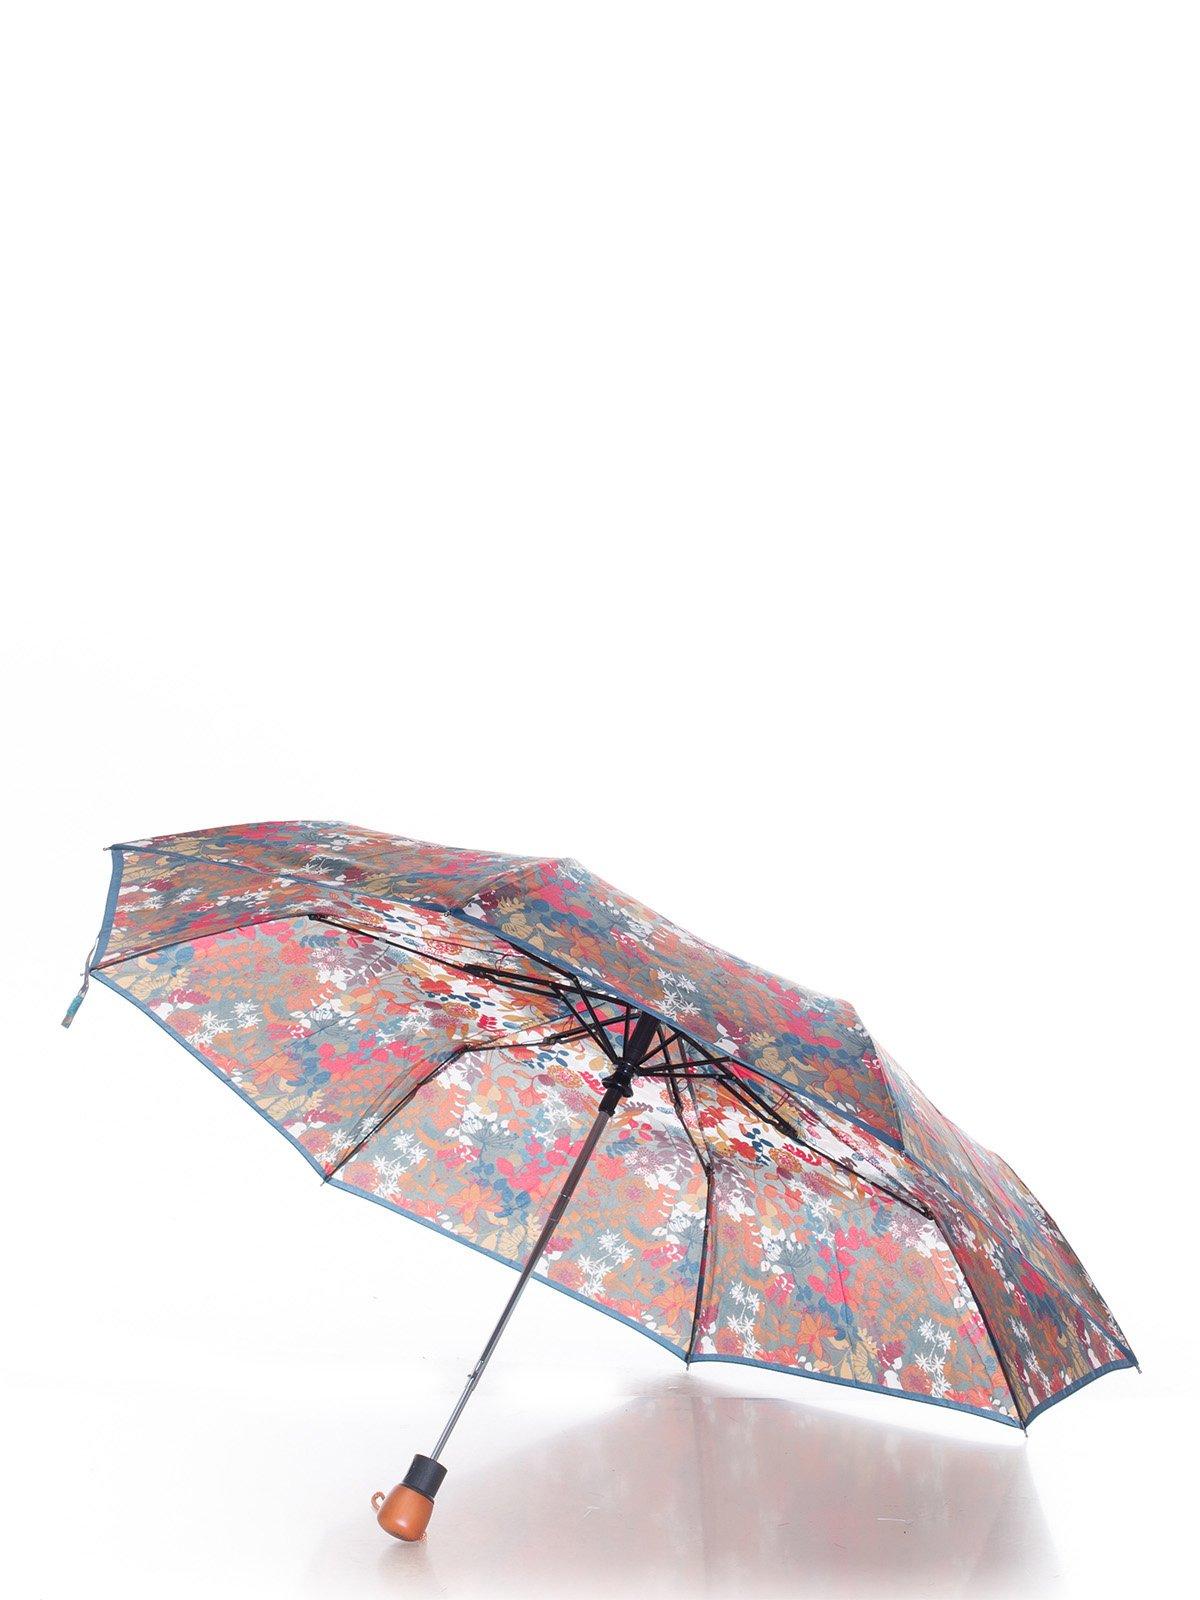 Зонт | 3296711 | фото 2